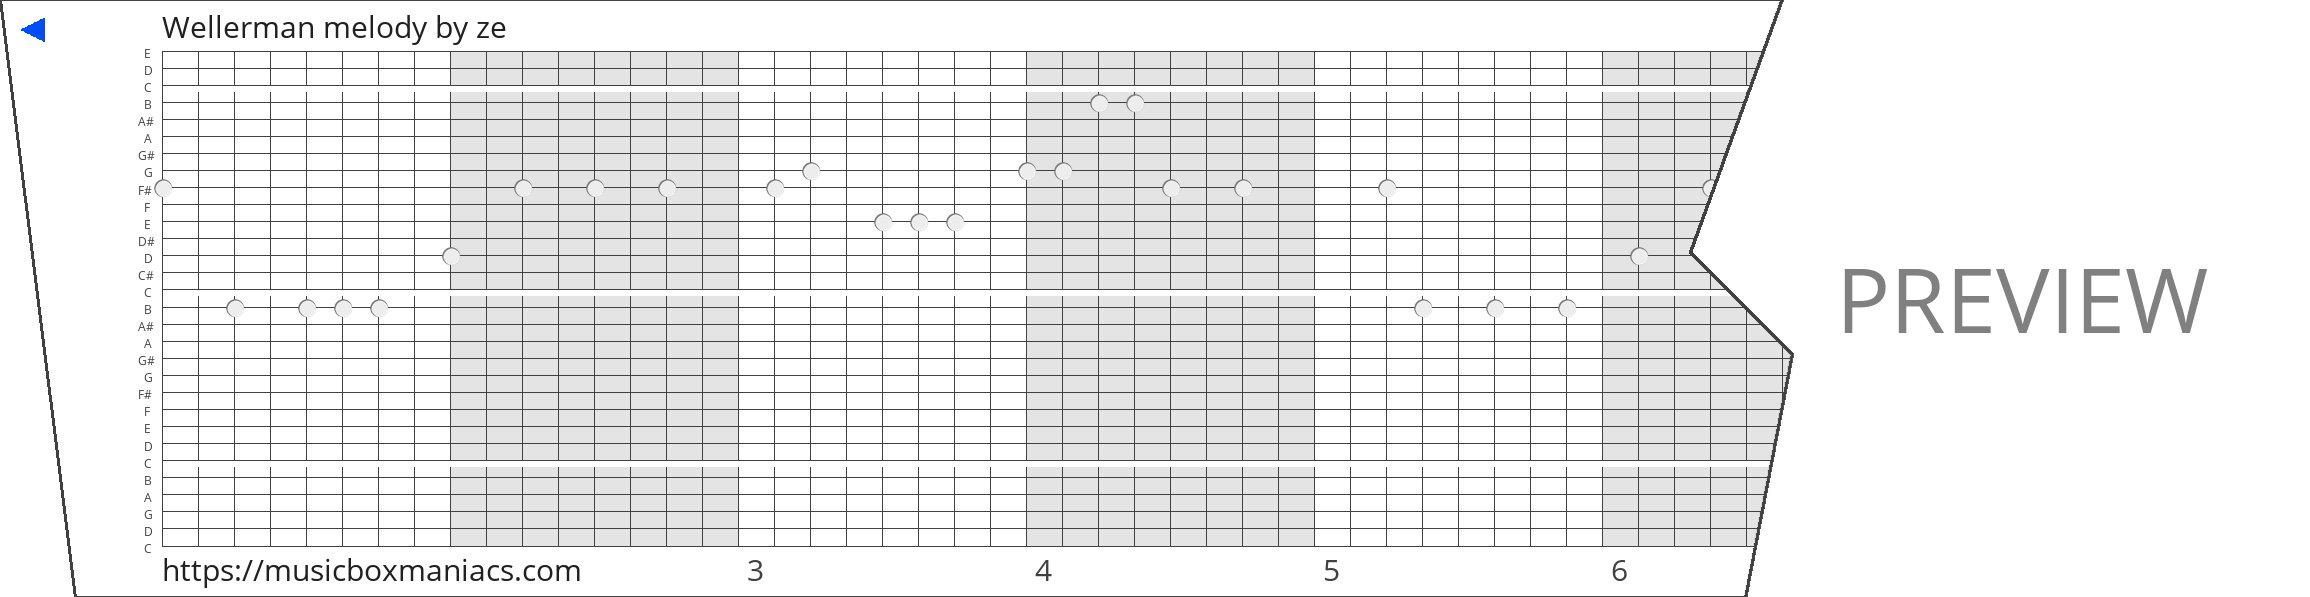 Wellerman melody 30 note music box paper strip